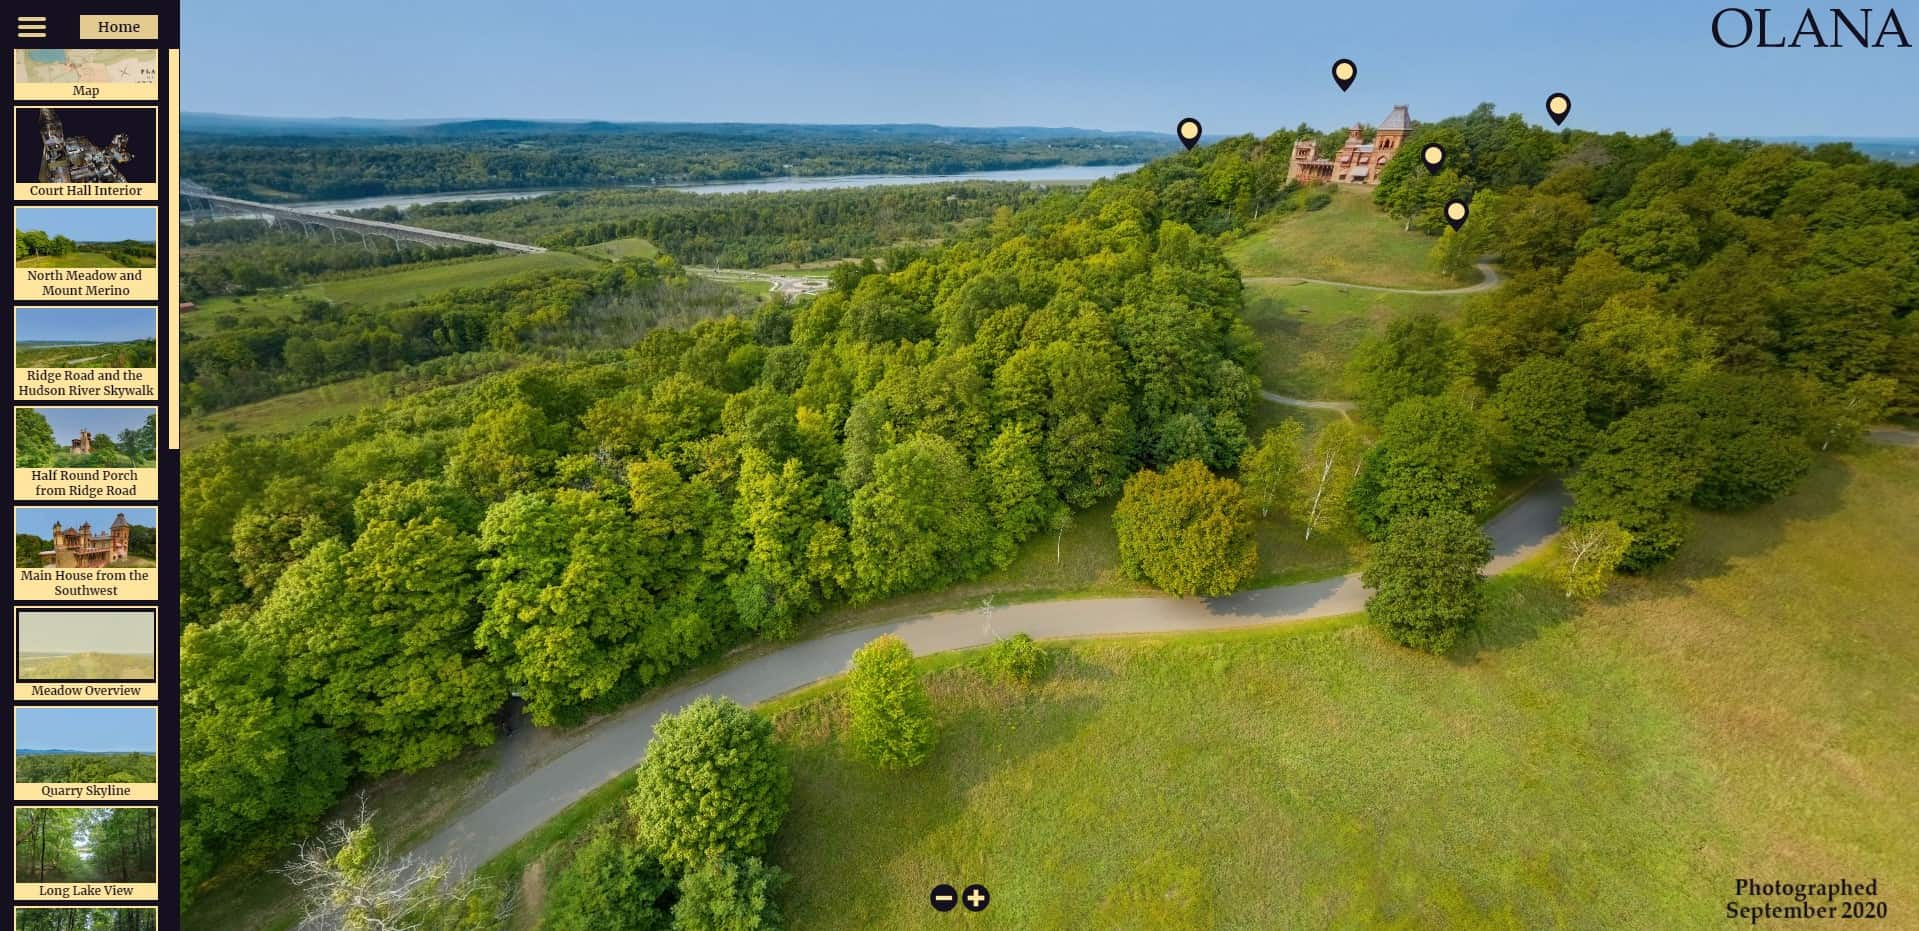 360 Landscape Overview